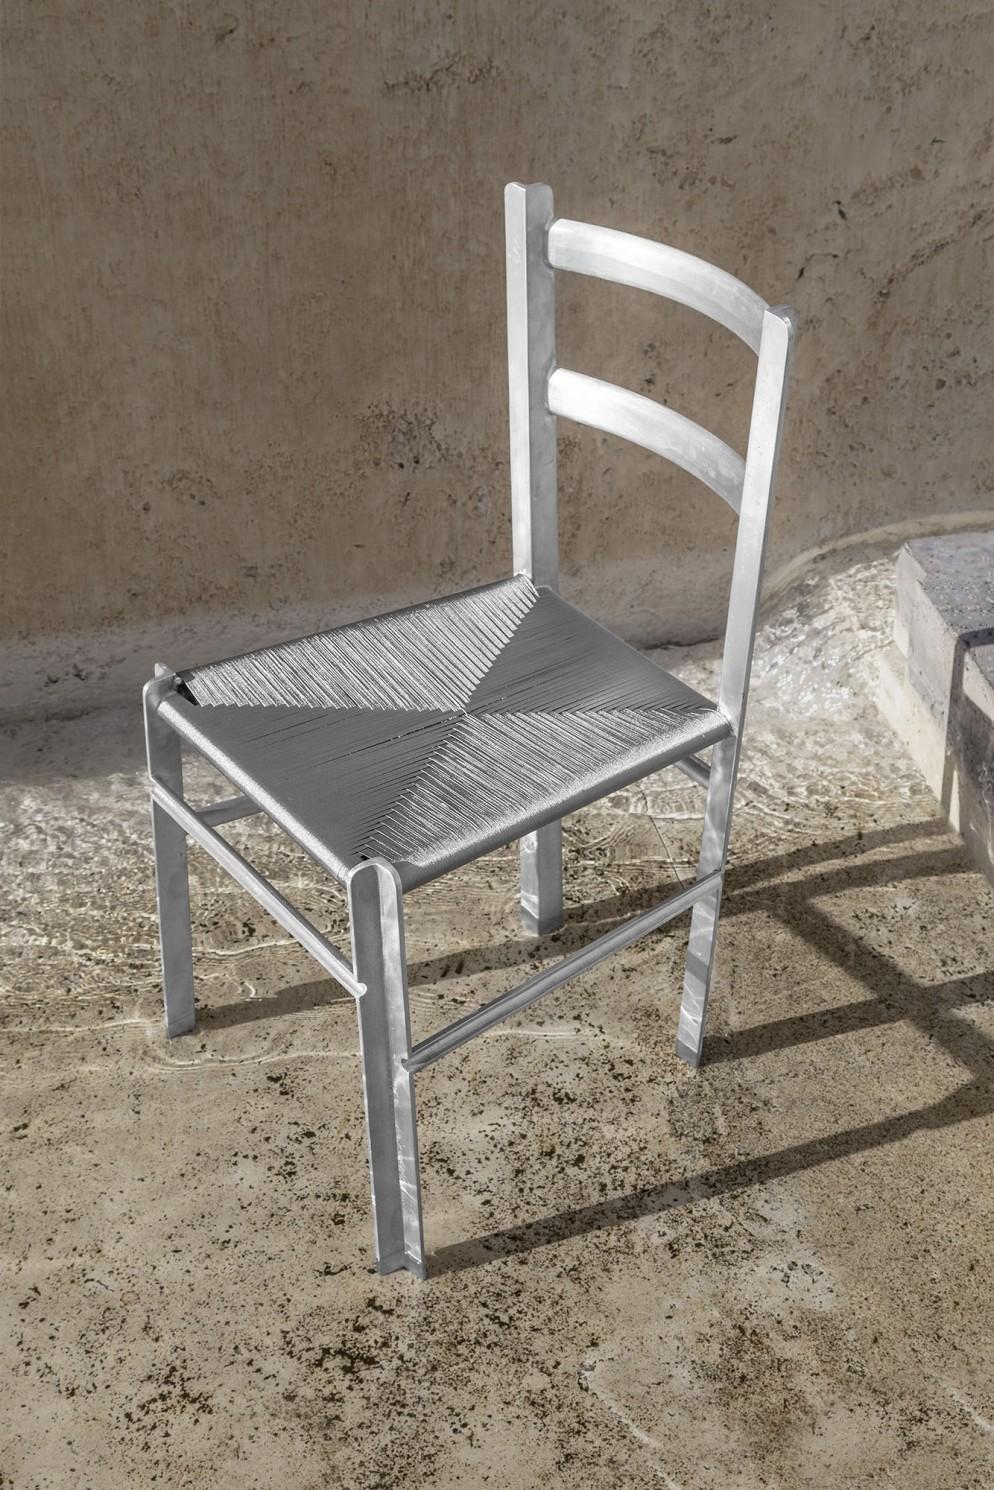 Francesco Faccin - Anonimo Contemporaneo - Aluminum Chair - Esterna -2LR-PhOmarGolli